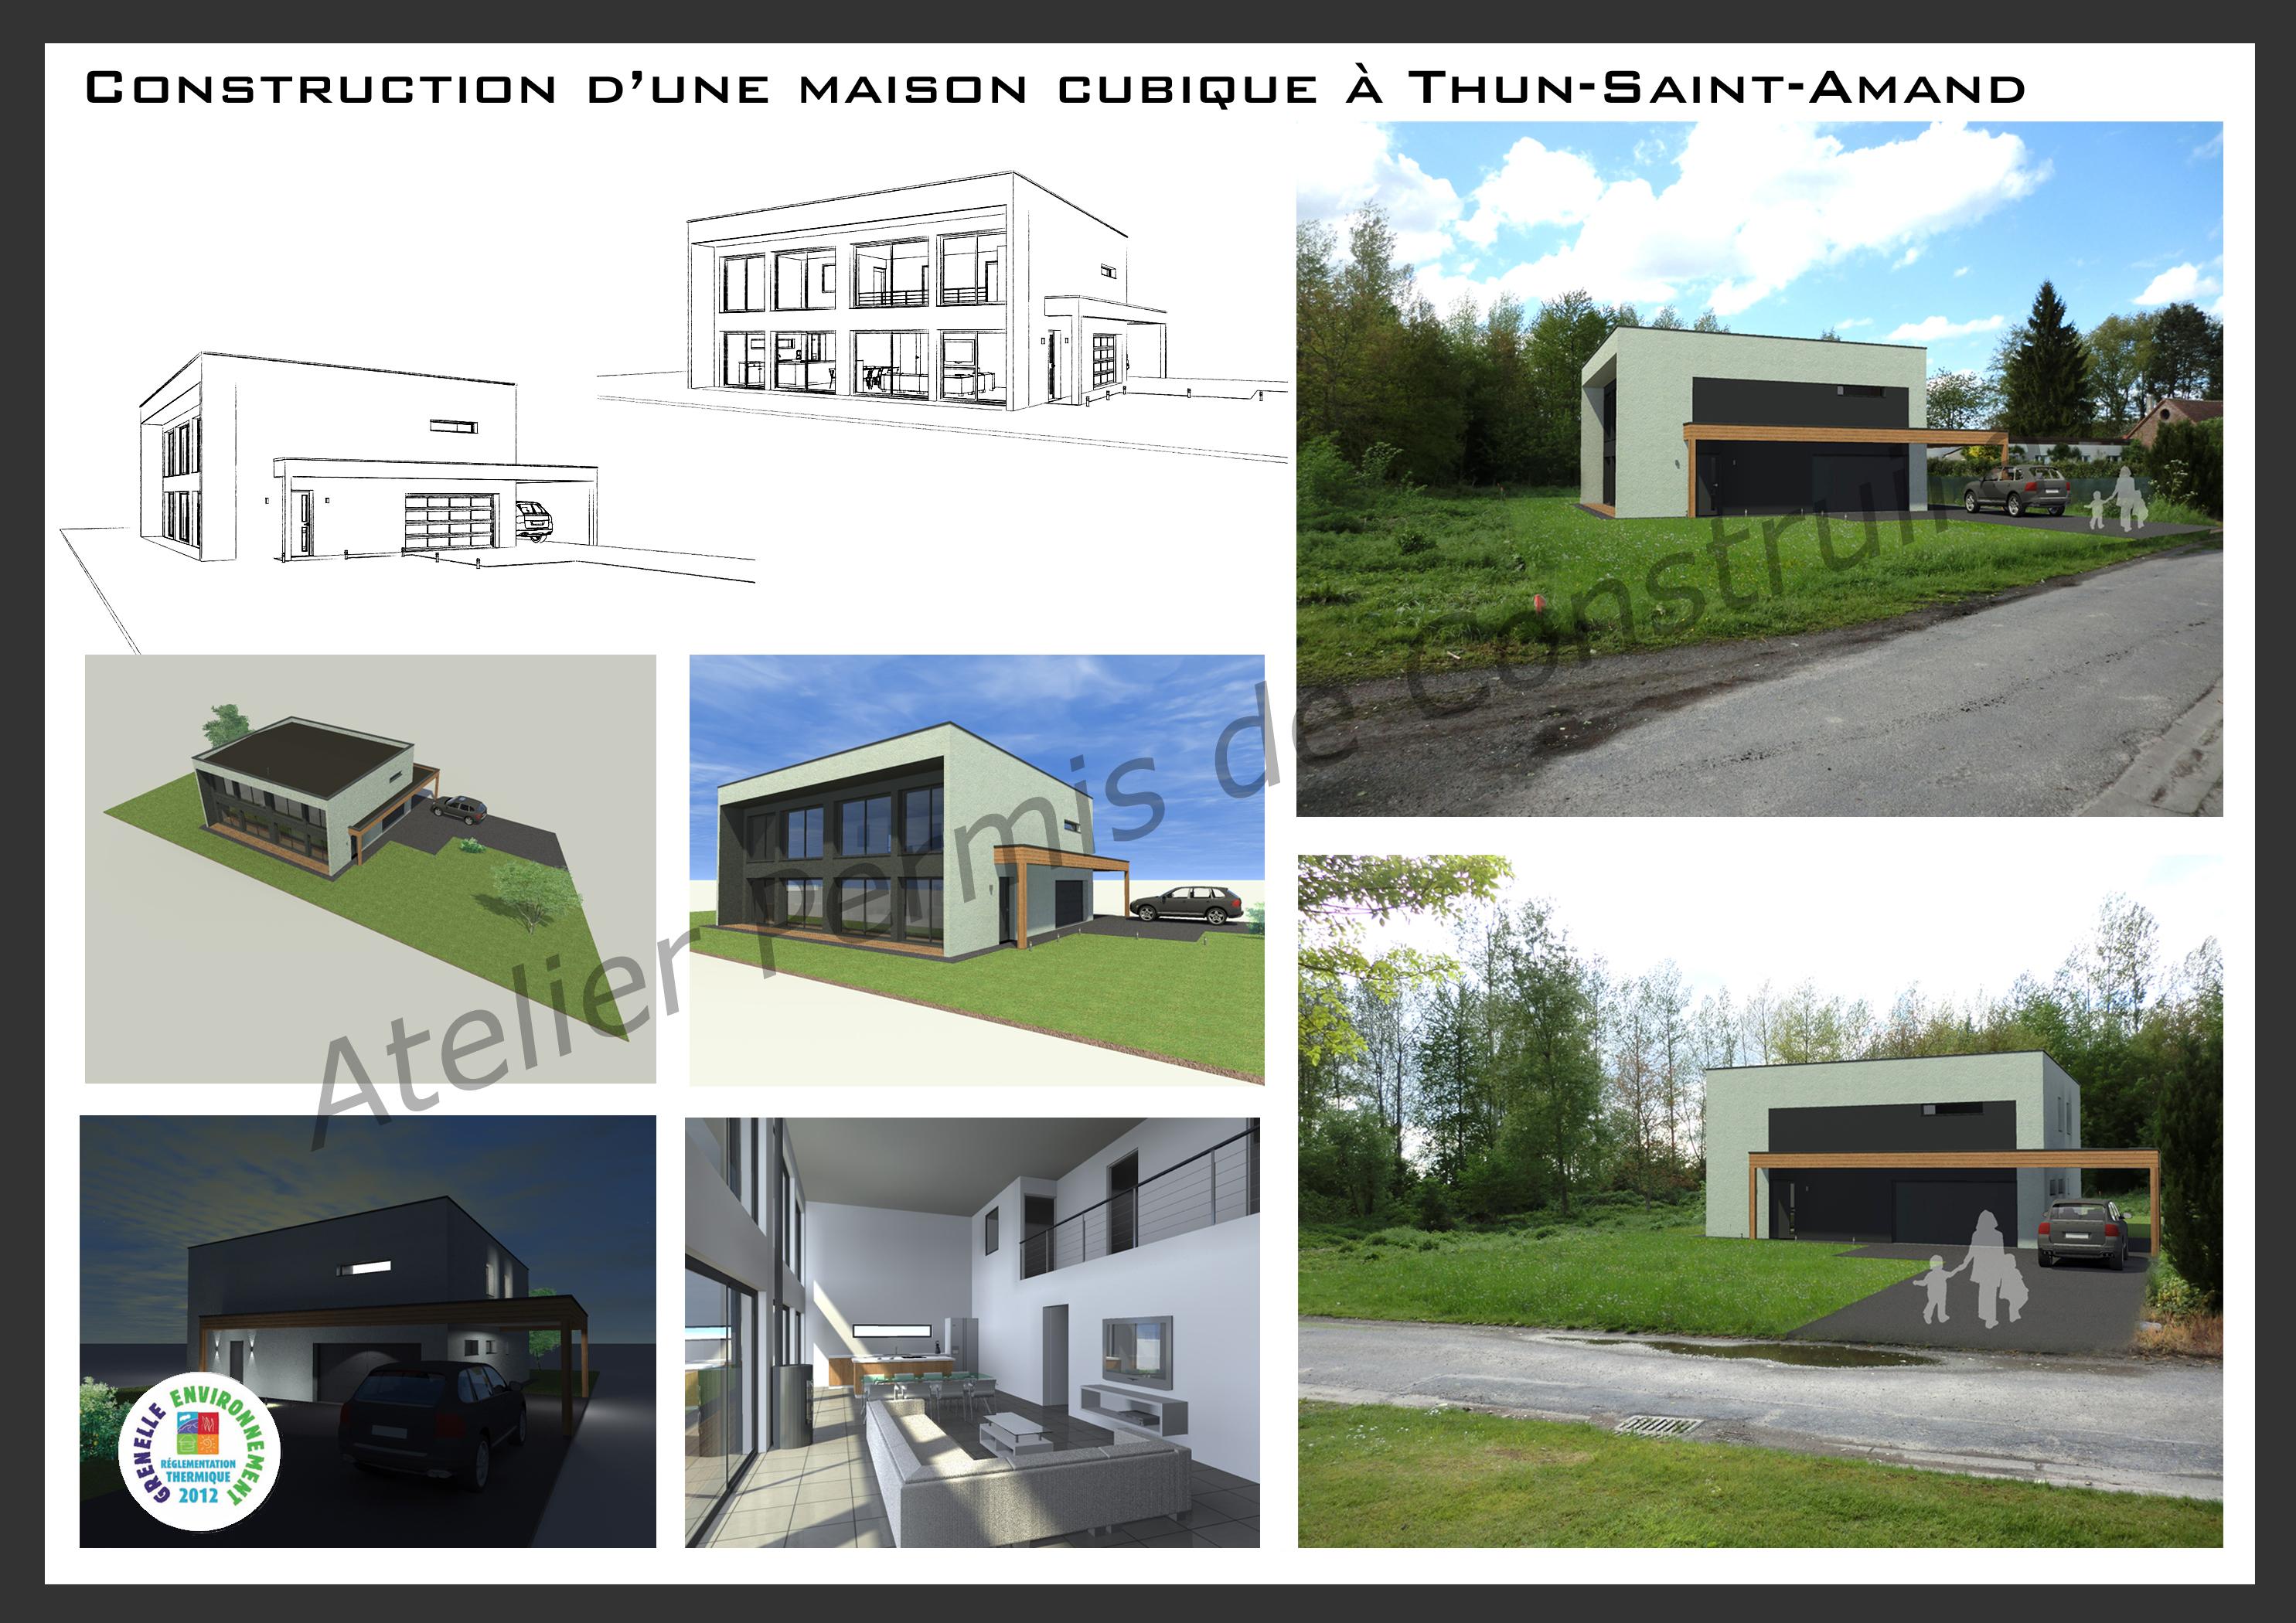 15.17 Permis de construire maison nord Thun Saint Amand